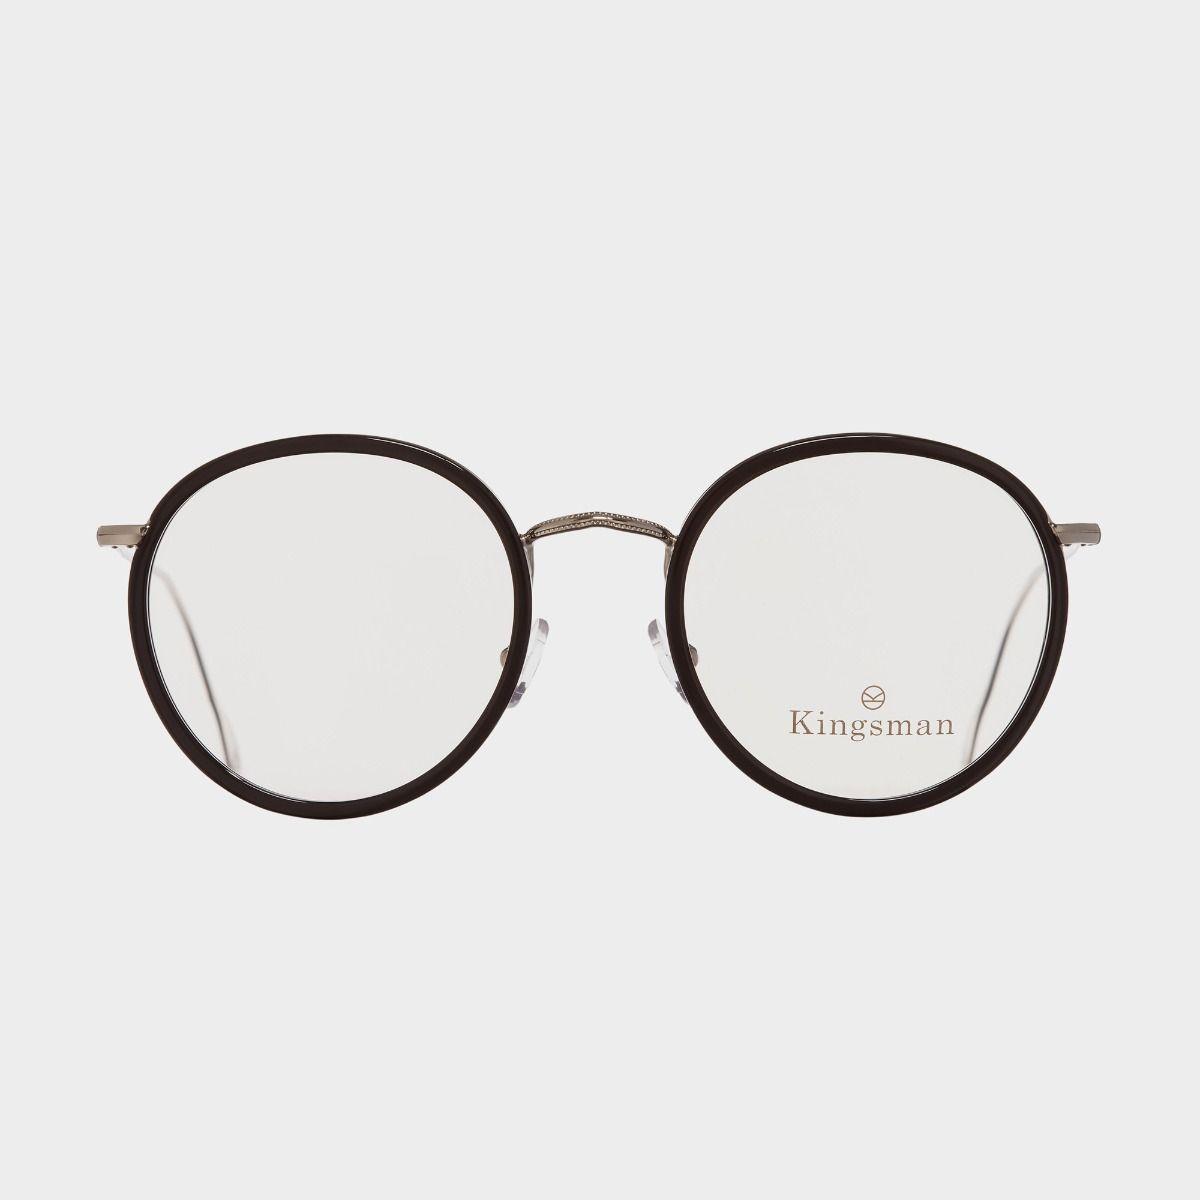 9000 Kingsman Optical Round Glasses